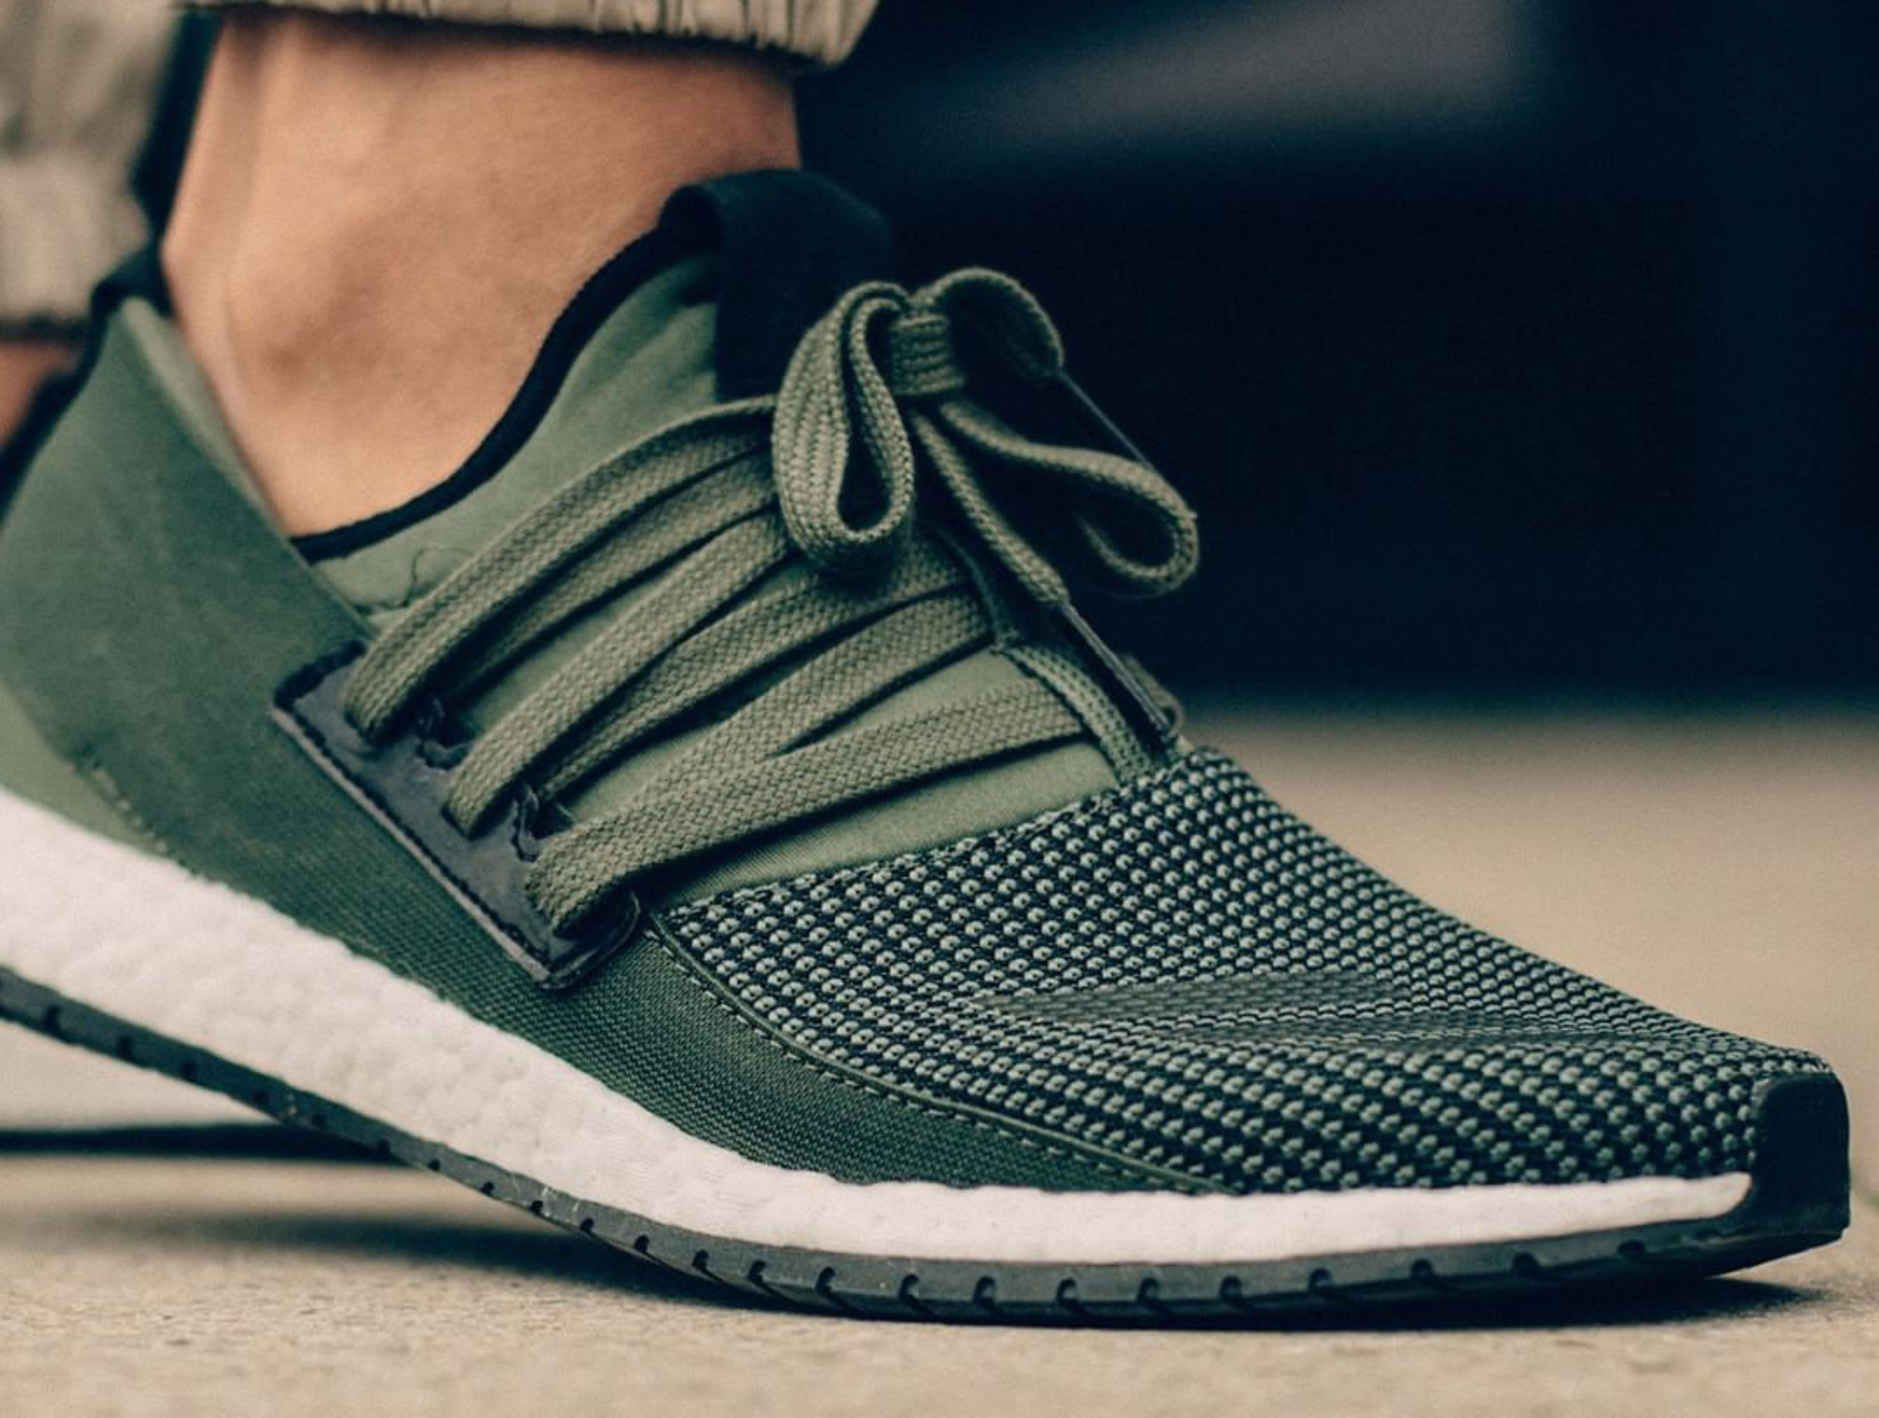 ladies adidas trainers green